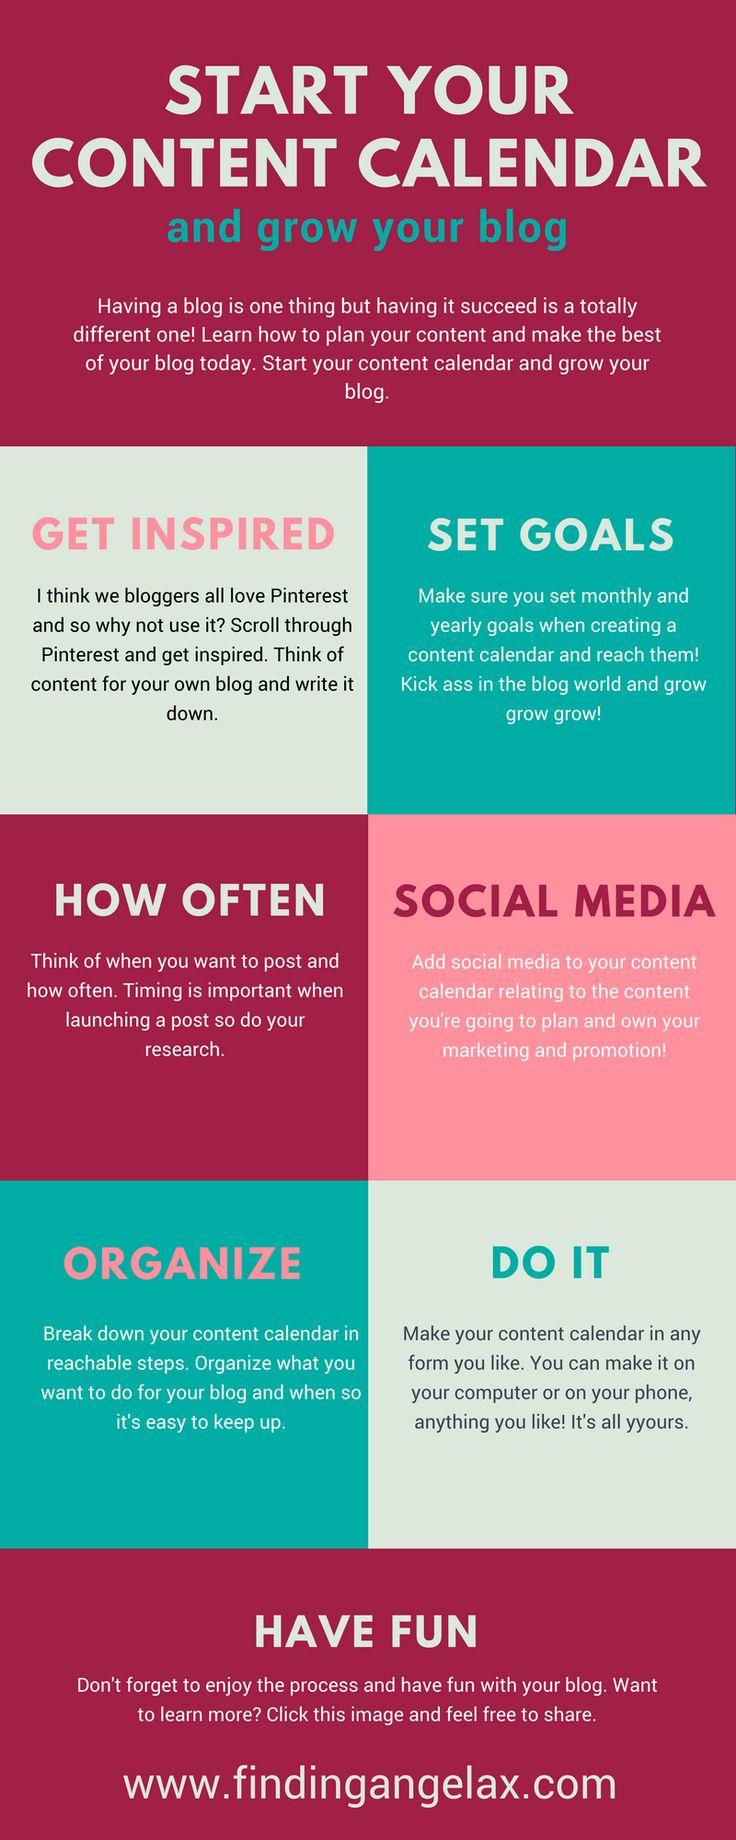 Start your content calendar and grow your blog social media